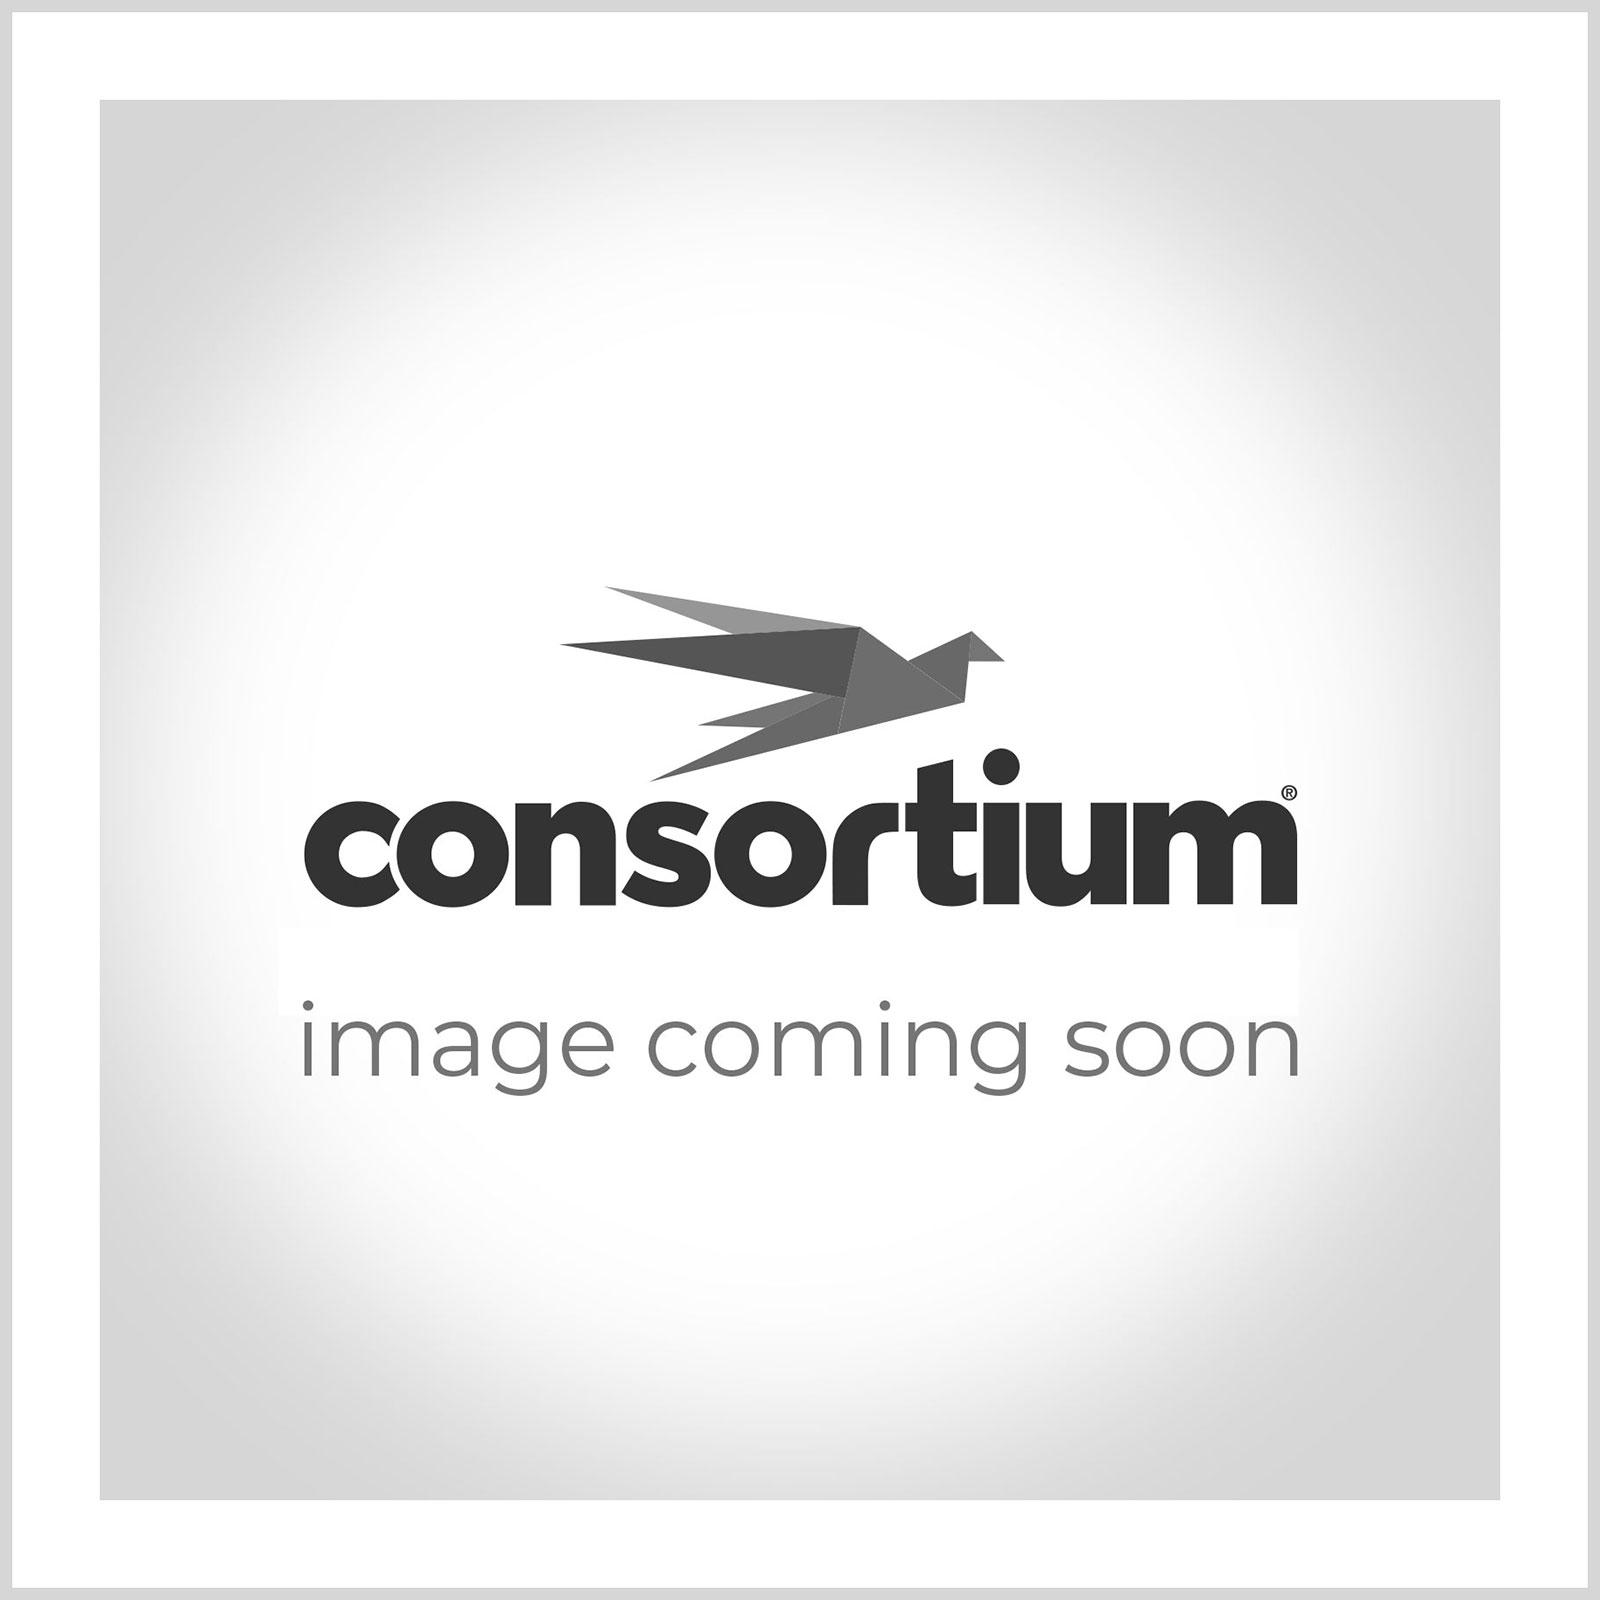 Consortium Bulk Tissue Dispenser